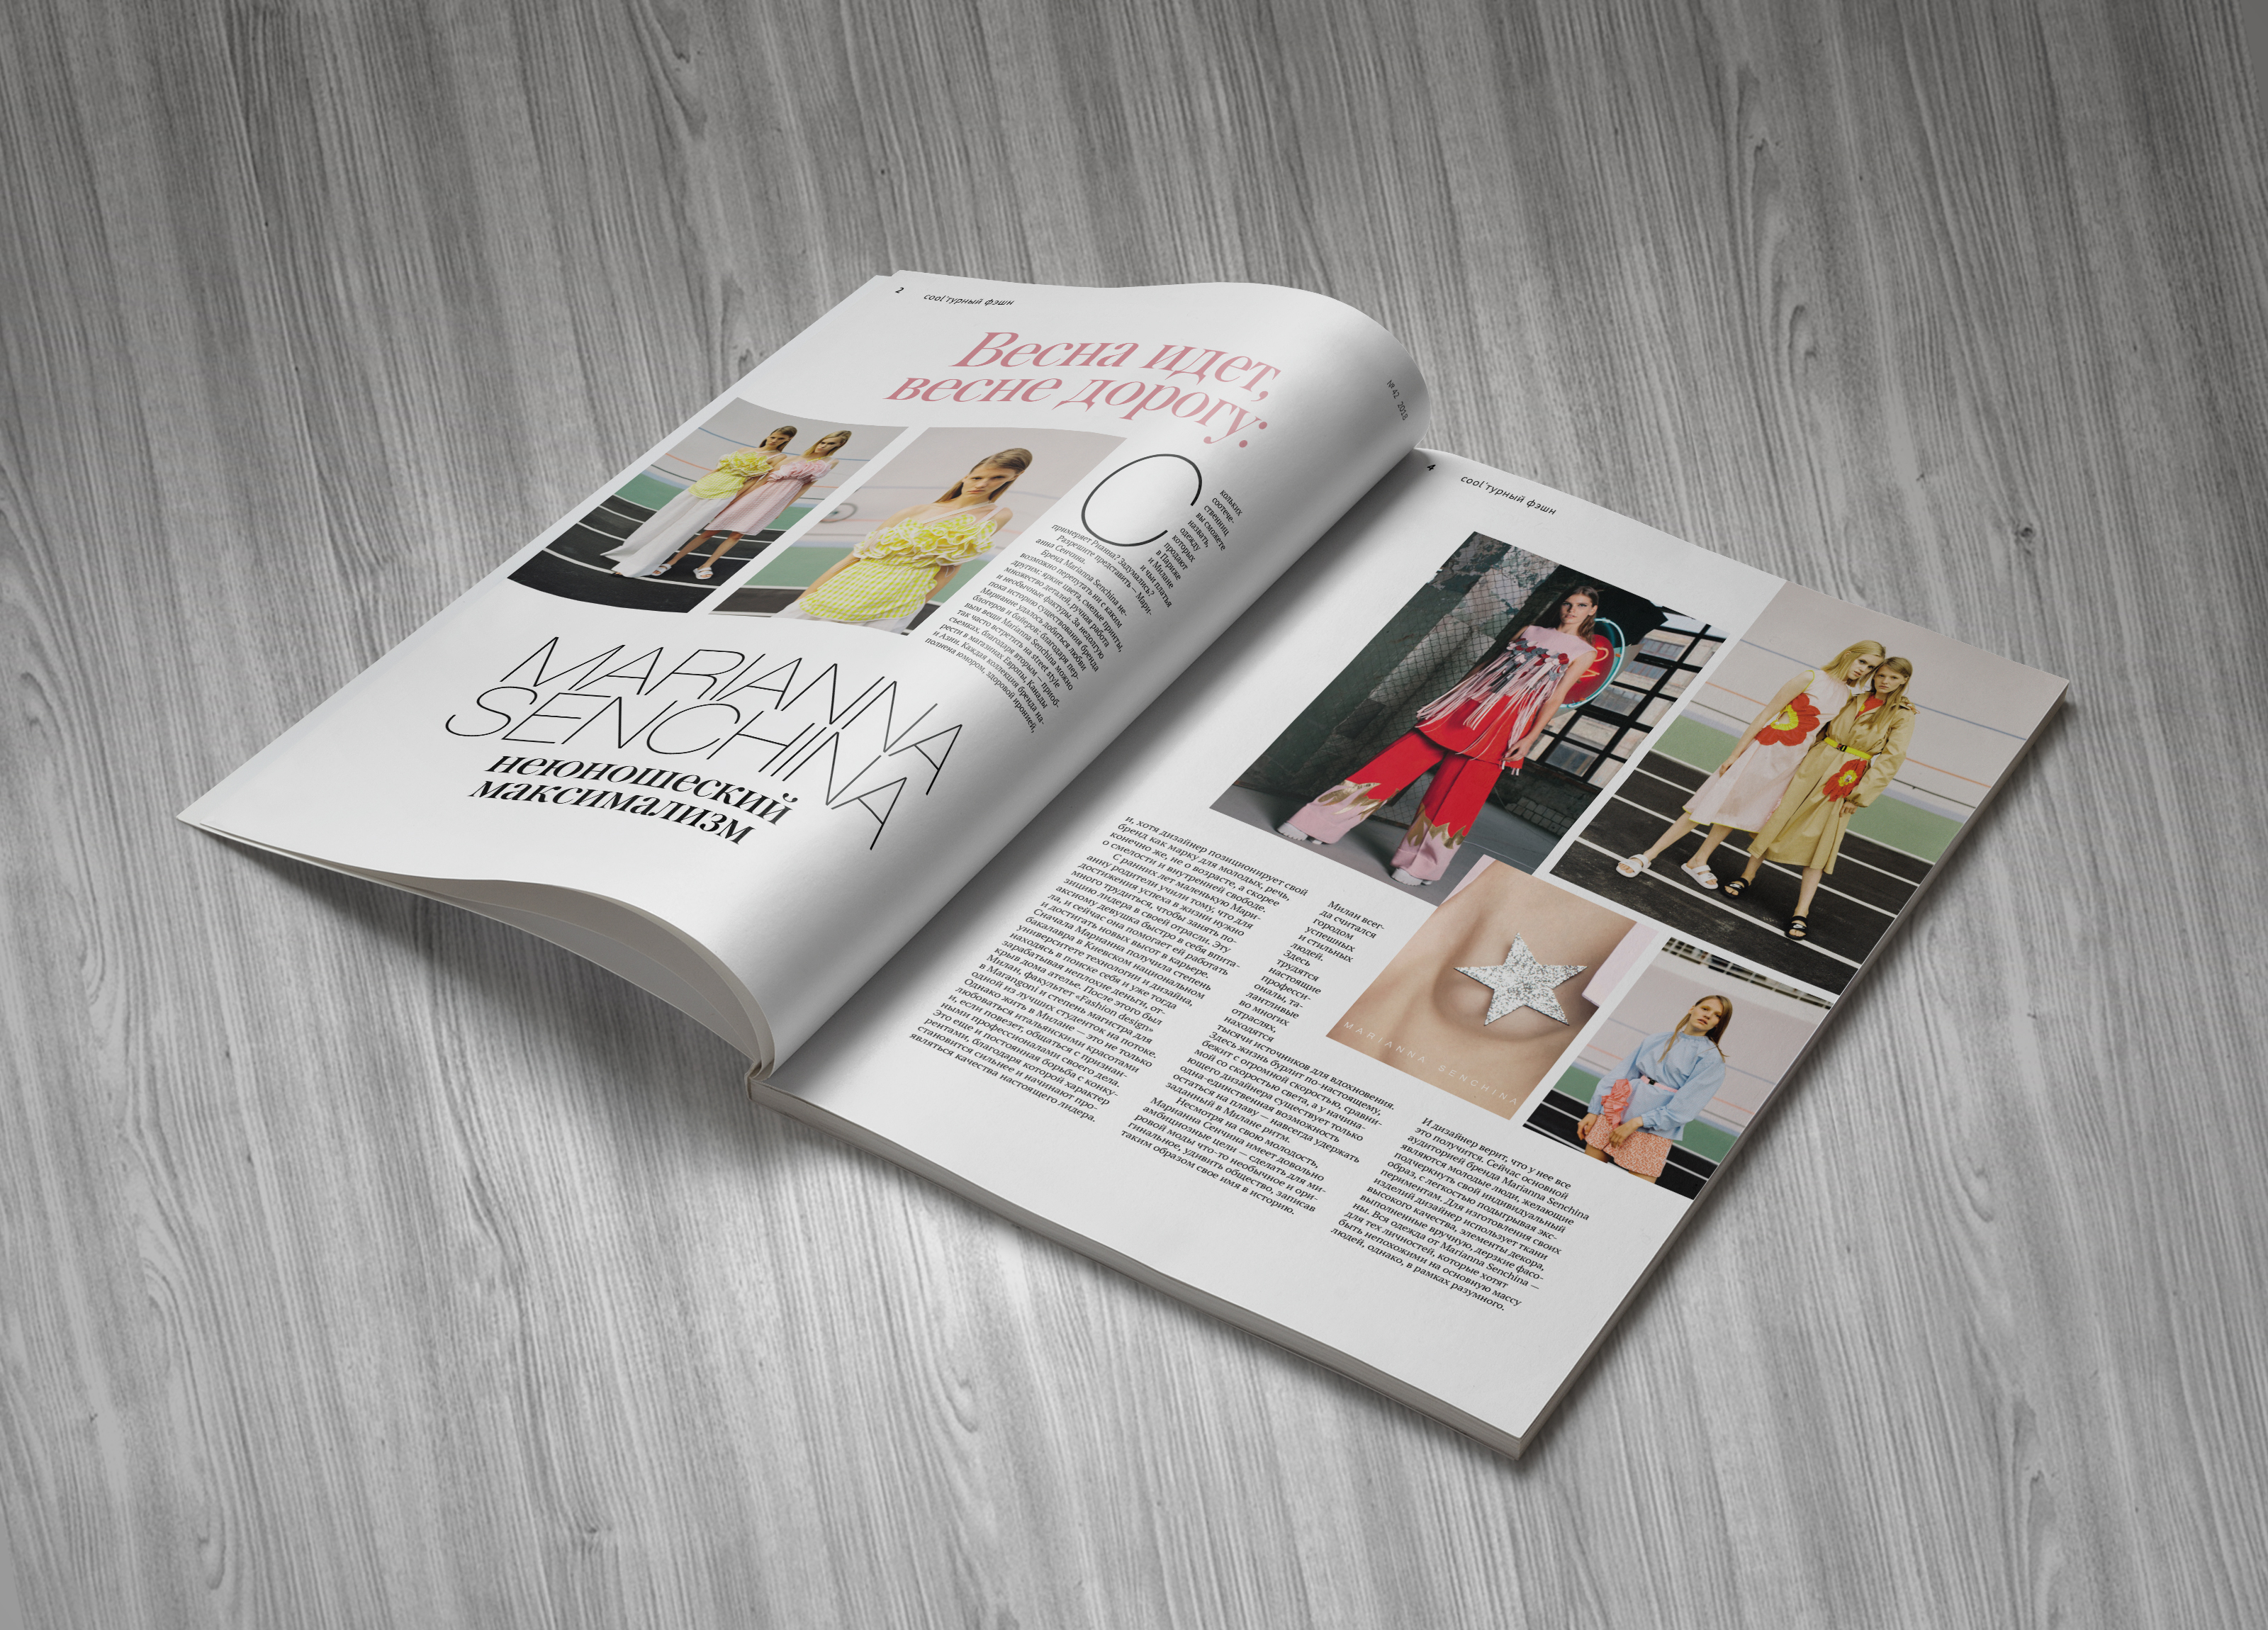 Глянцевый журнал «CoolBaba» №42март 2018— разработка дизайна ивёрстка журнала Разработка журналов Портфолио